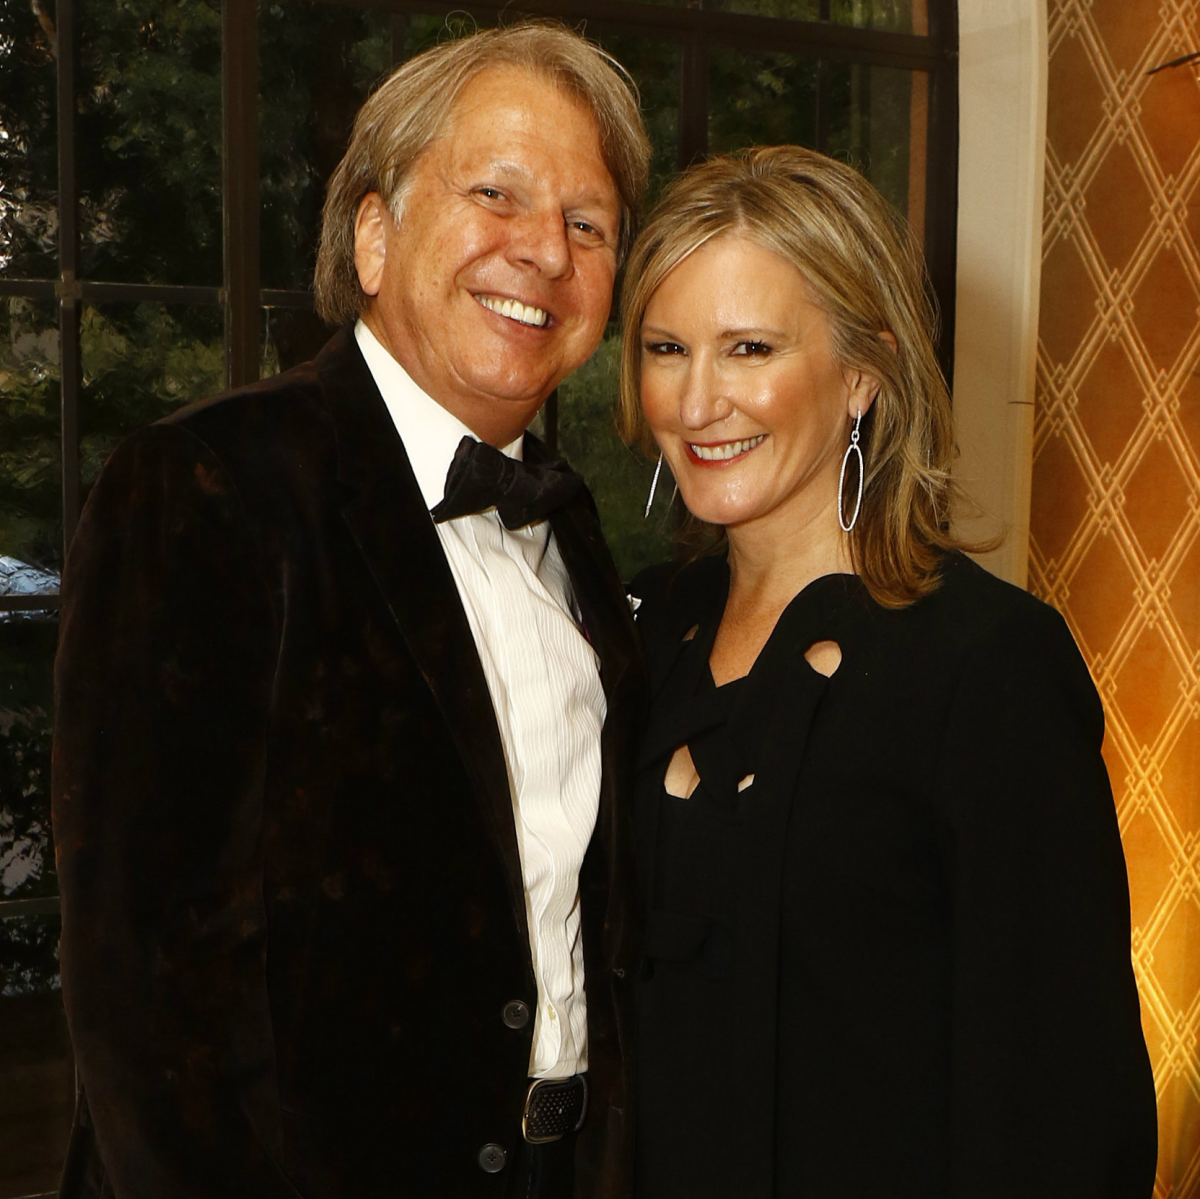 Dean Fearing and Wanda Gierhart